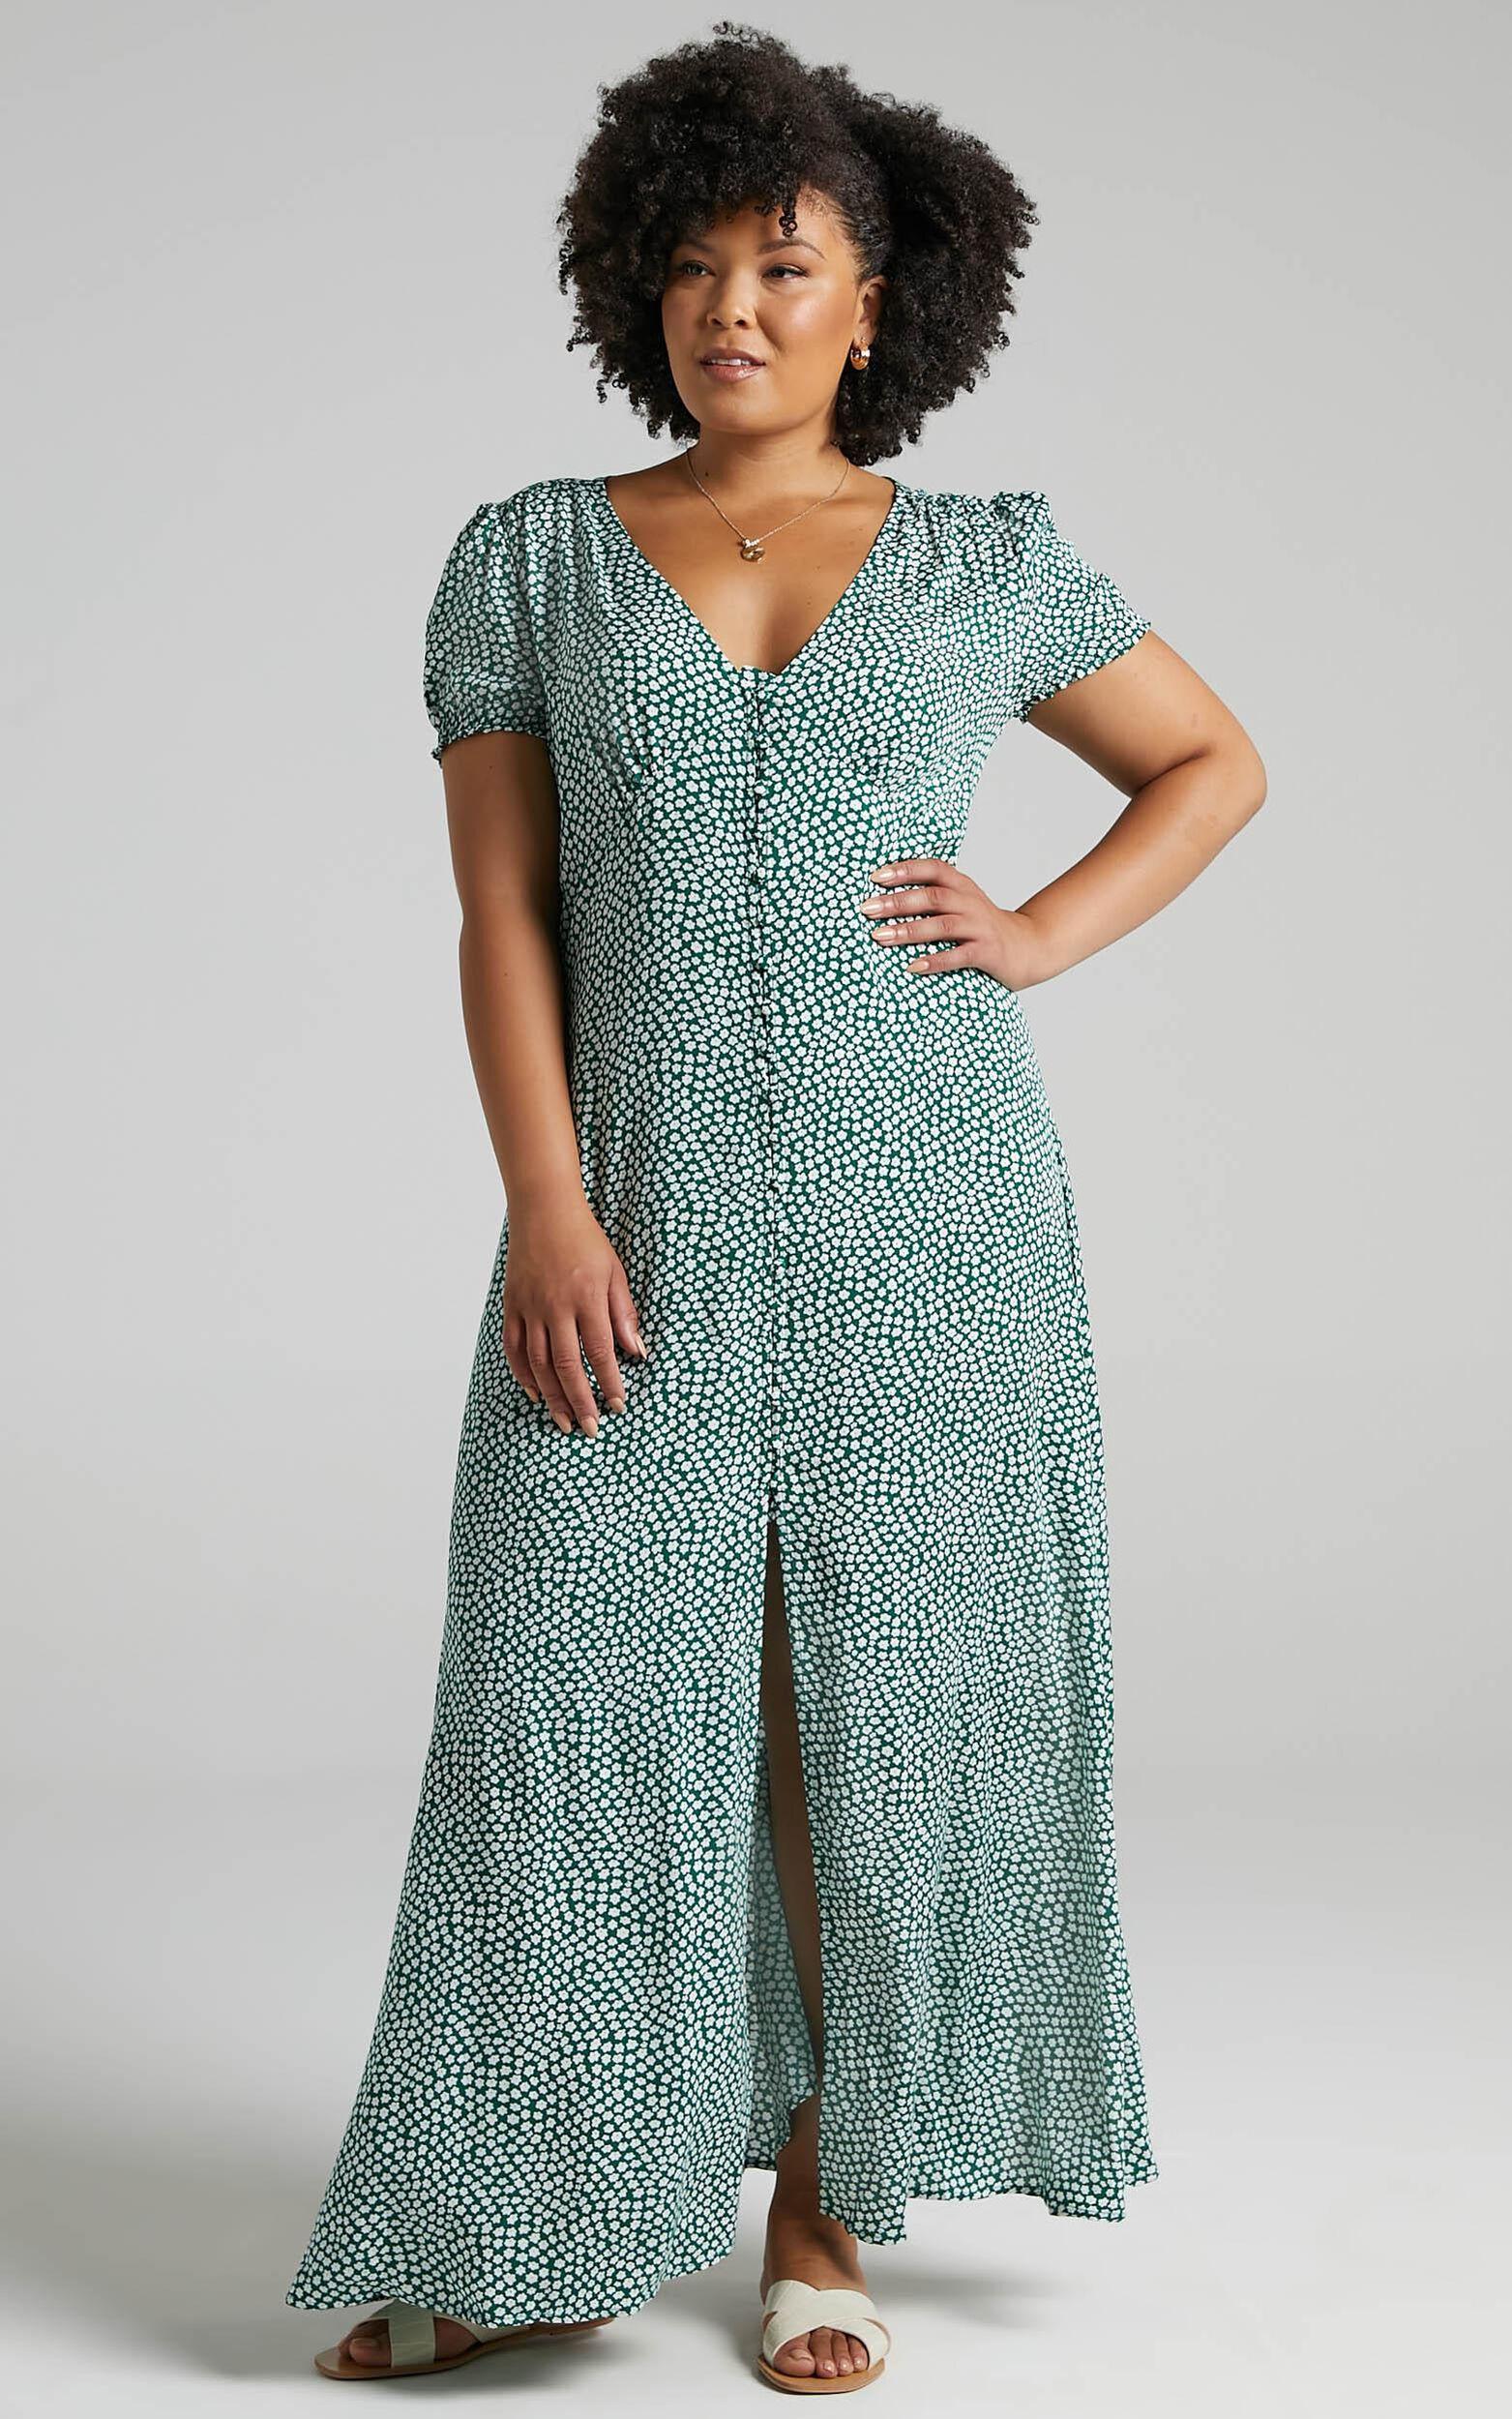 Flaming Hot Button Up V Neck Maxi Dress in Green Floral - 20, GRN2, super-hi-res image number null